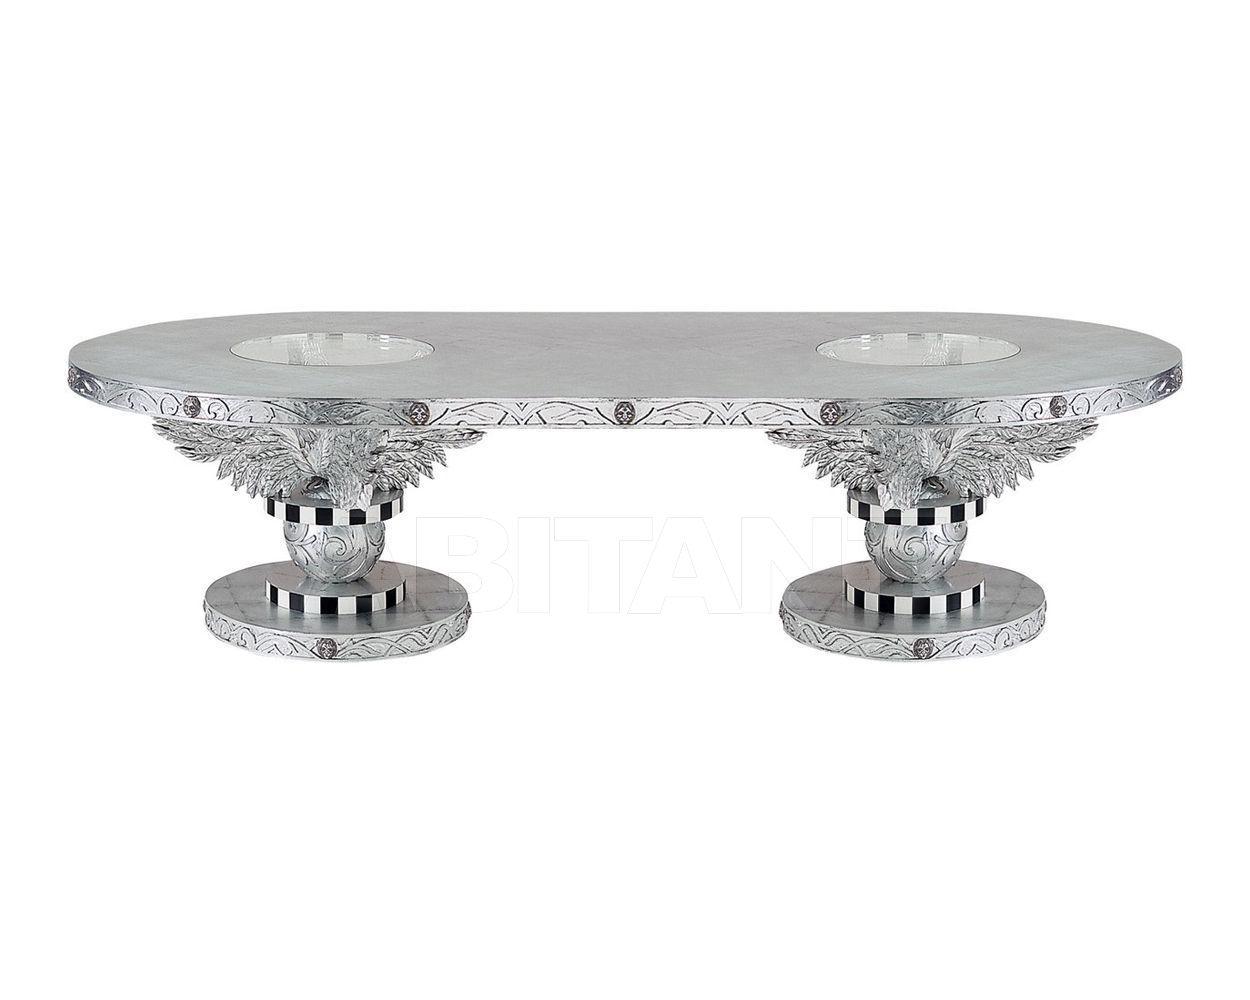 Купить Стол обеденный Colombostile s.p.a. Xxi Secolo Un Mondo Aperto/leggende Future 0206 TA